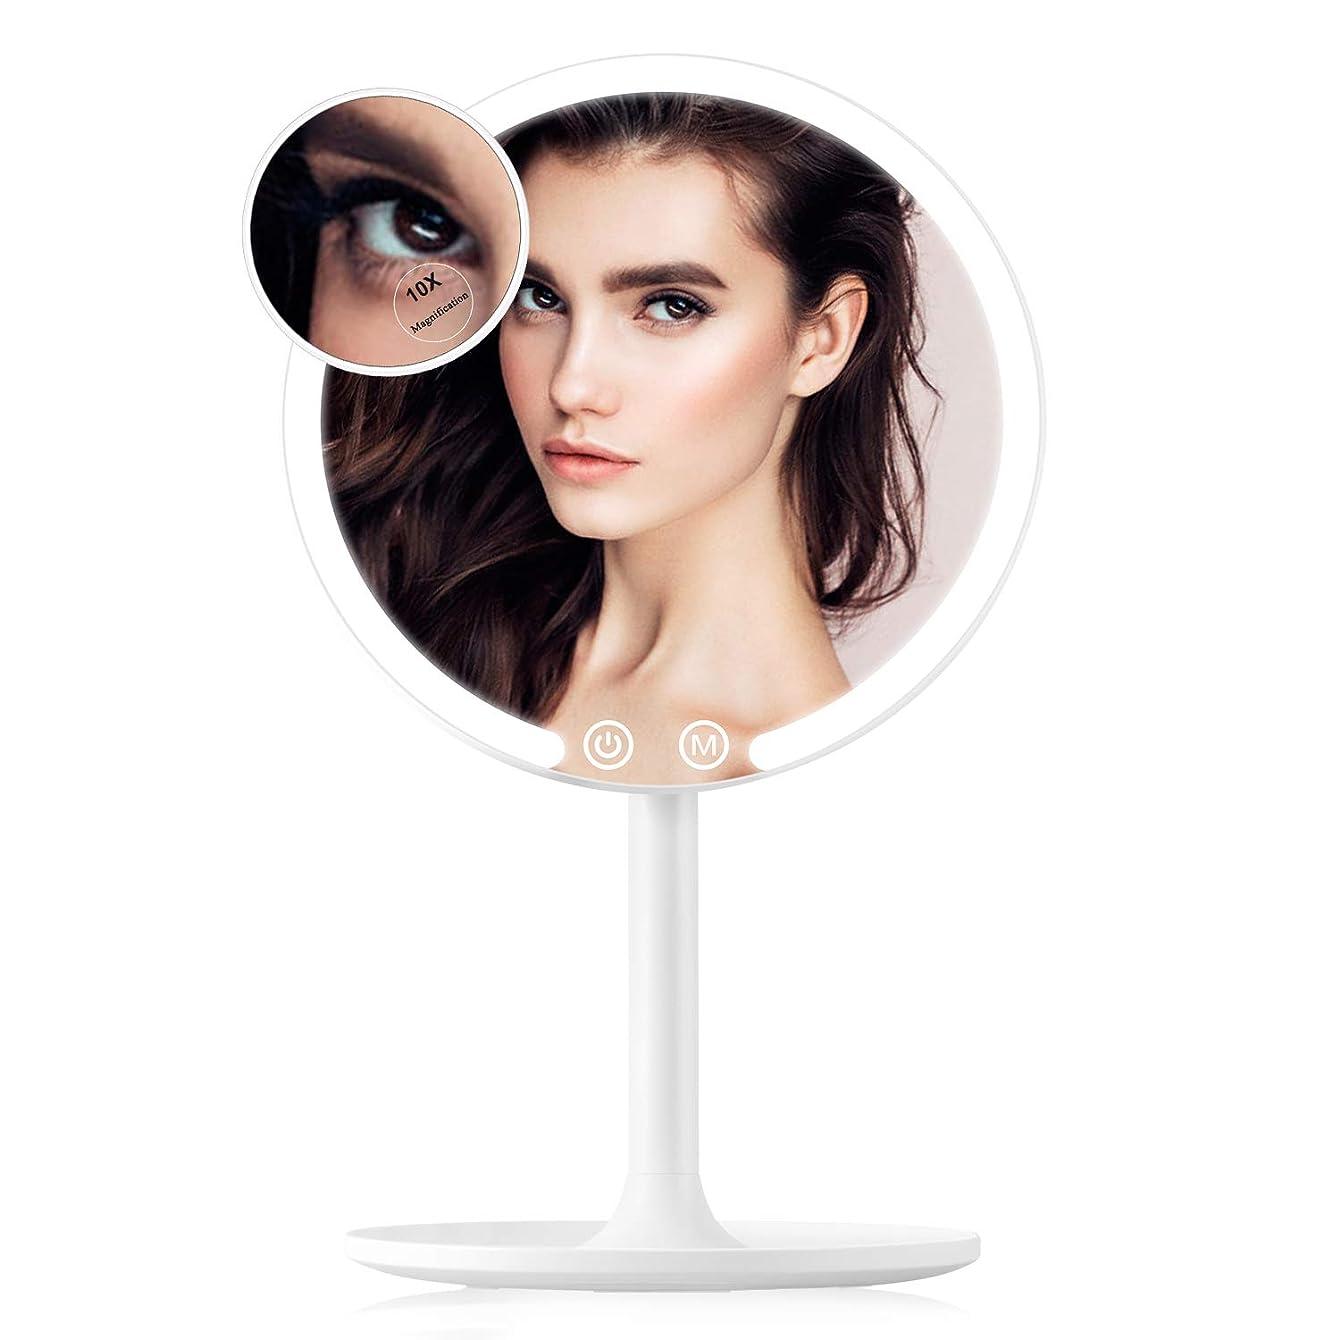 Easehold ミニ卓上化粧鏡 化粧ミラー 充電可能 42個LED付き スタンドミラー 3色のライトモード 調光可能 90°回転 1倍/10倍拡大鏡 取り外し可能 指タッチ メイク スキンケア